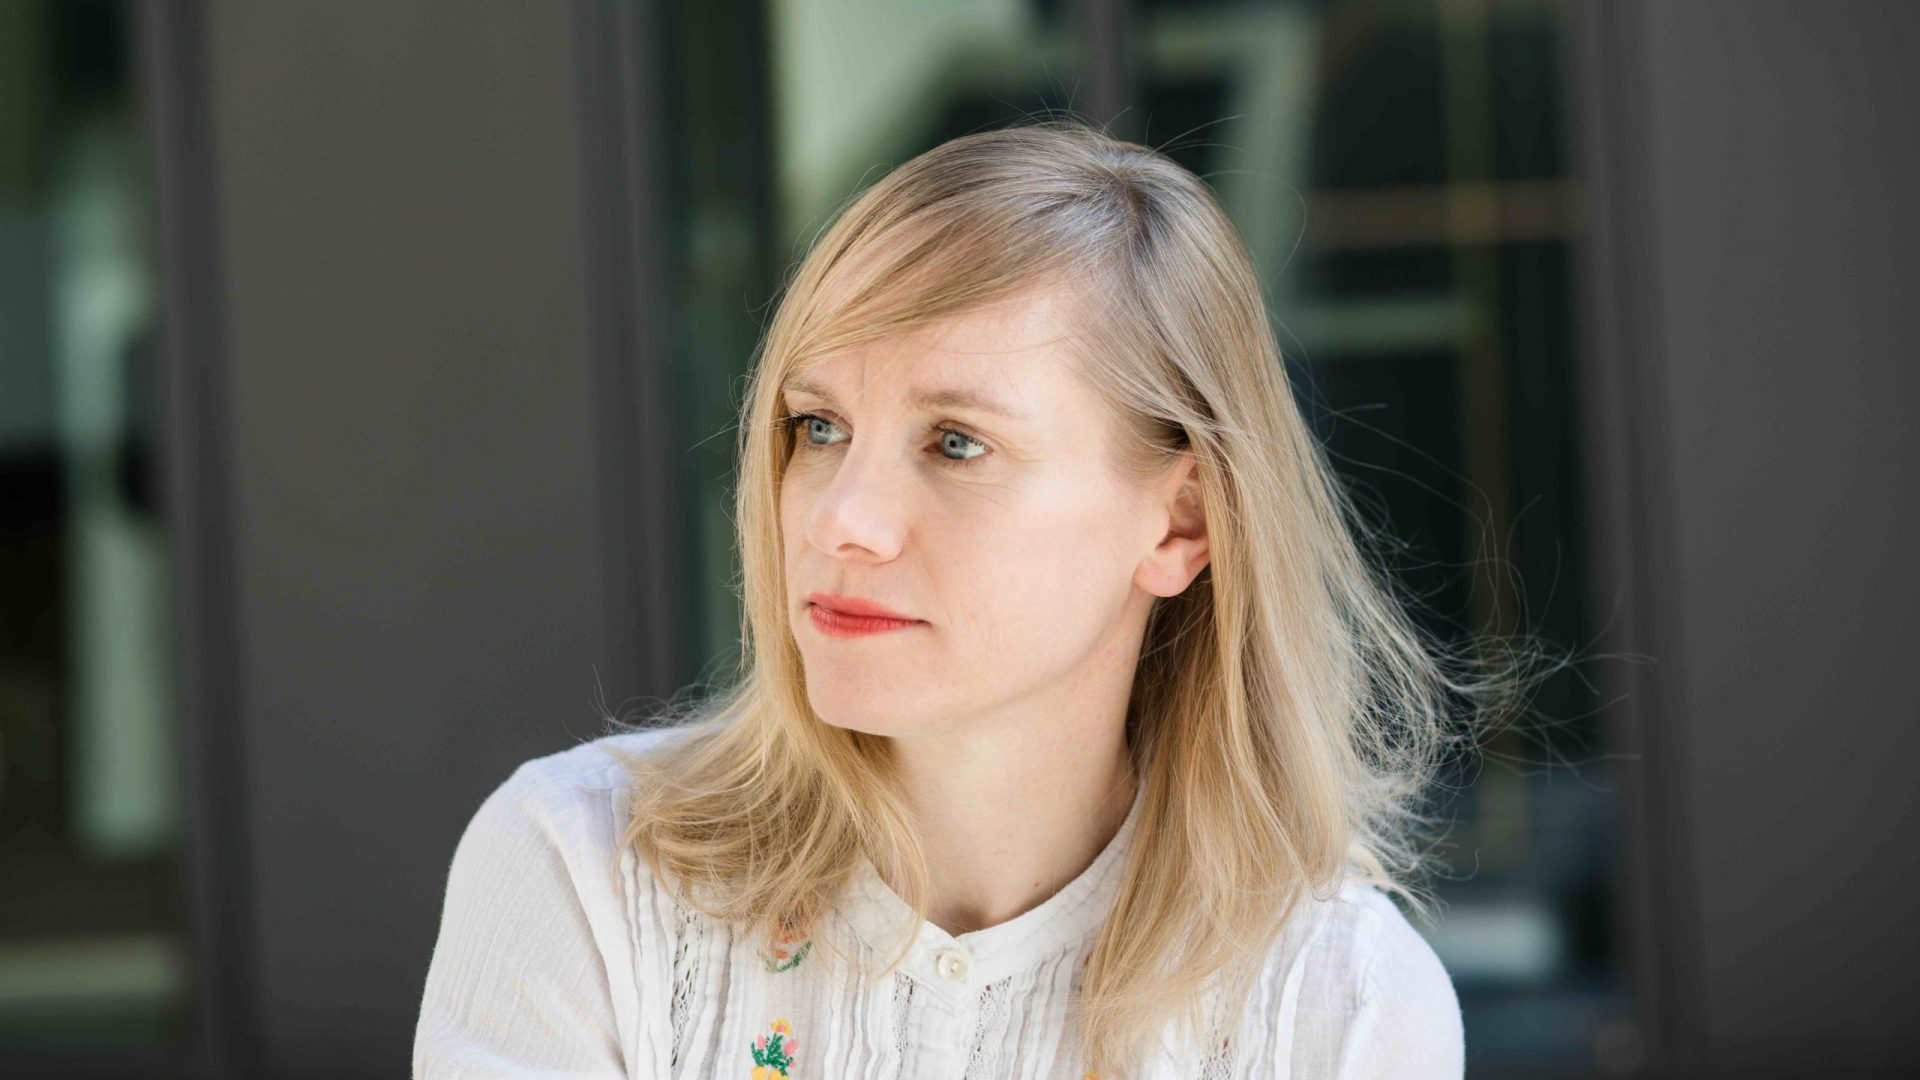 Daniela Voß